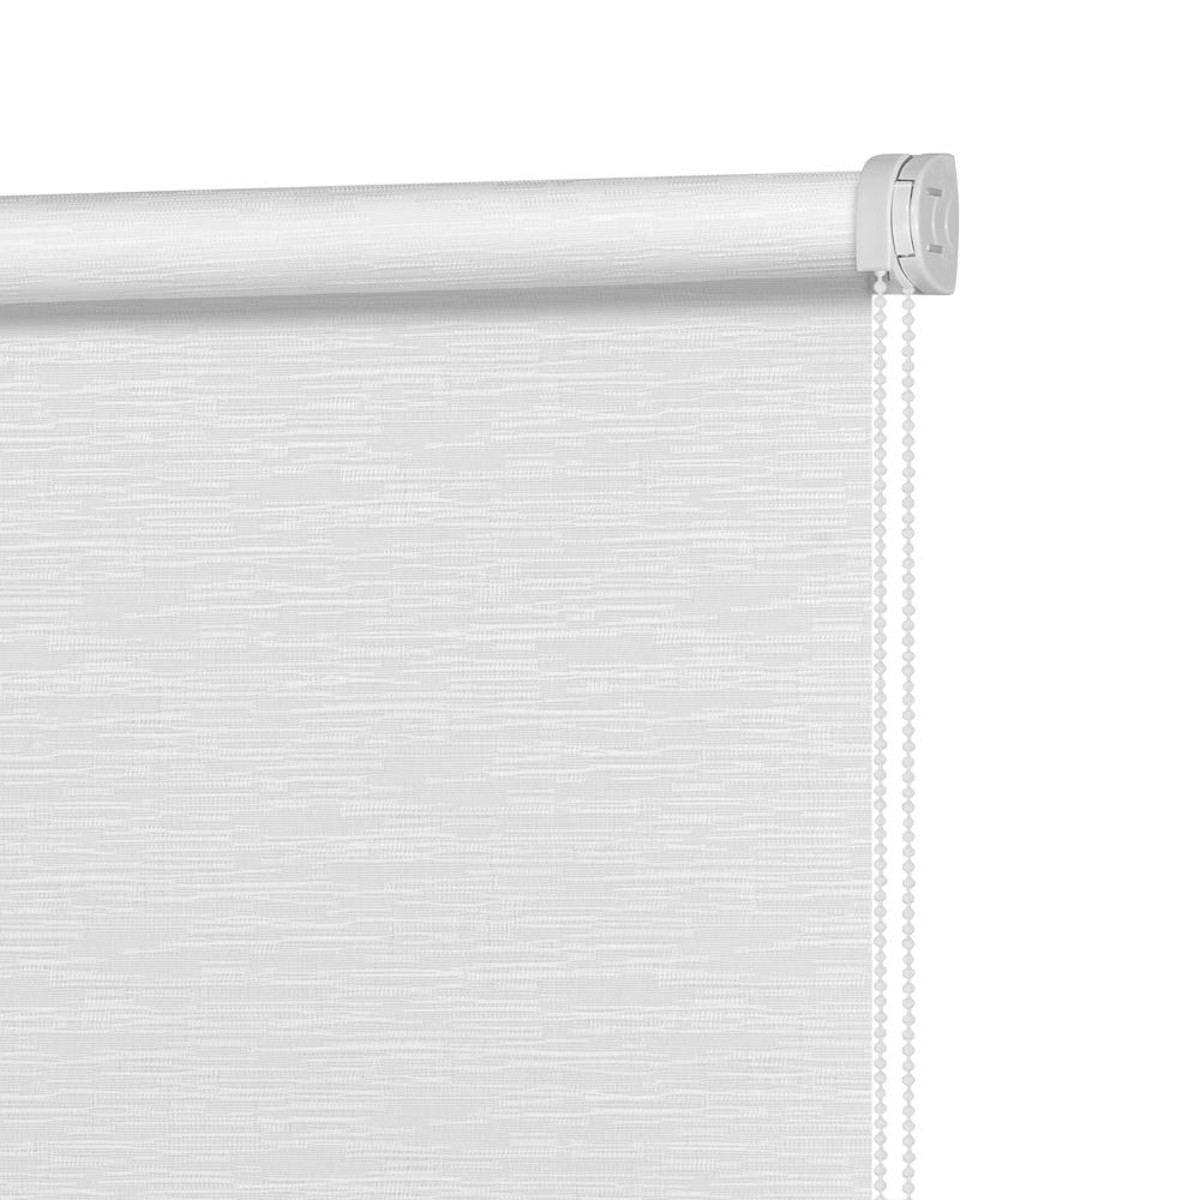 Рулонная Ора Decofest Эко 70Х160 Цвет Белый